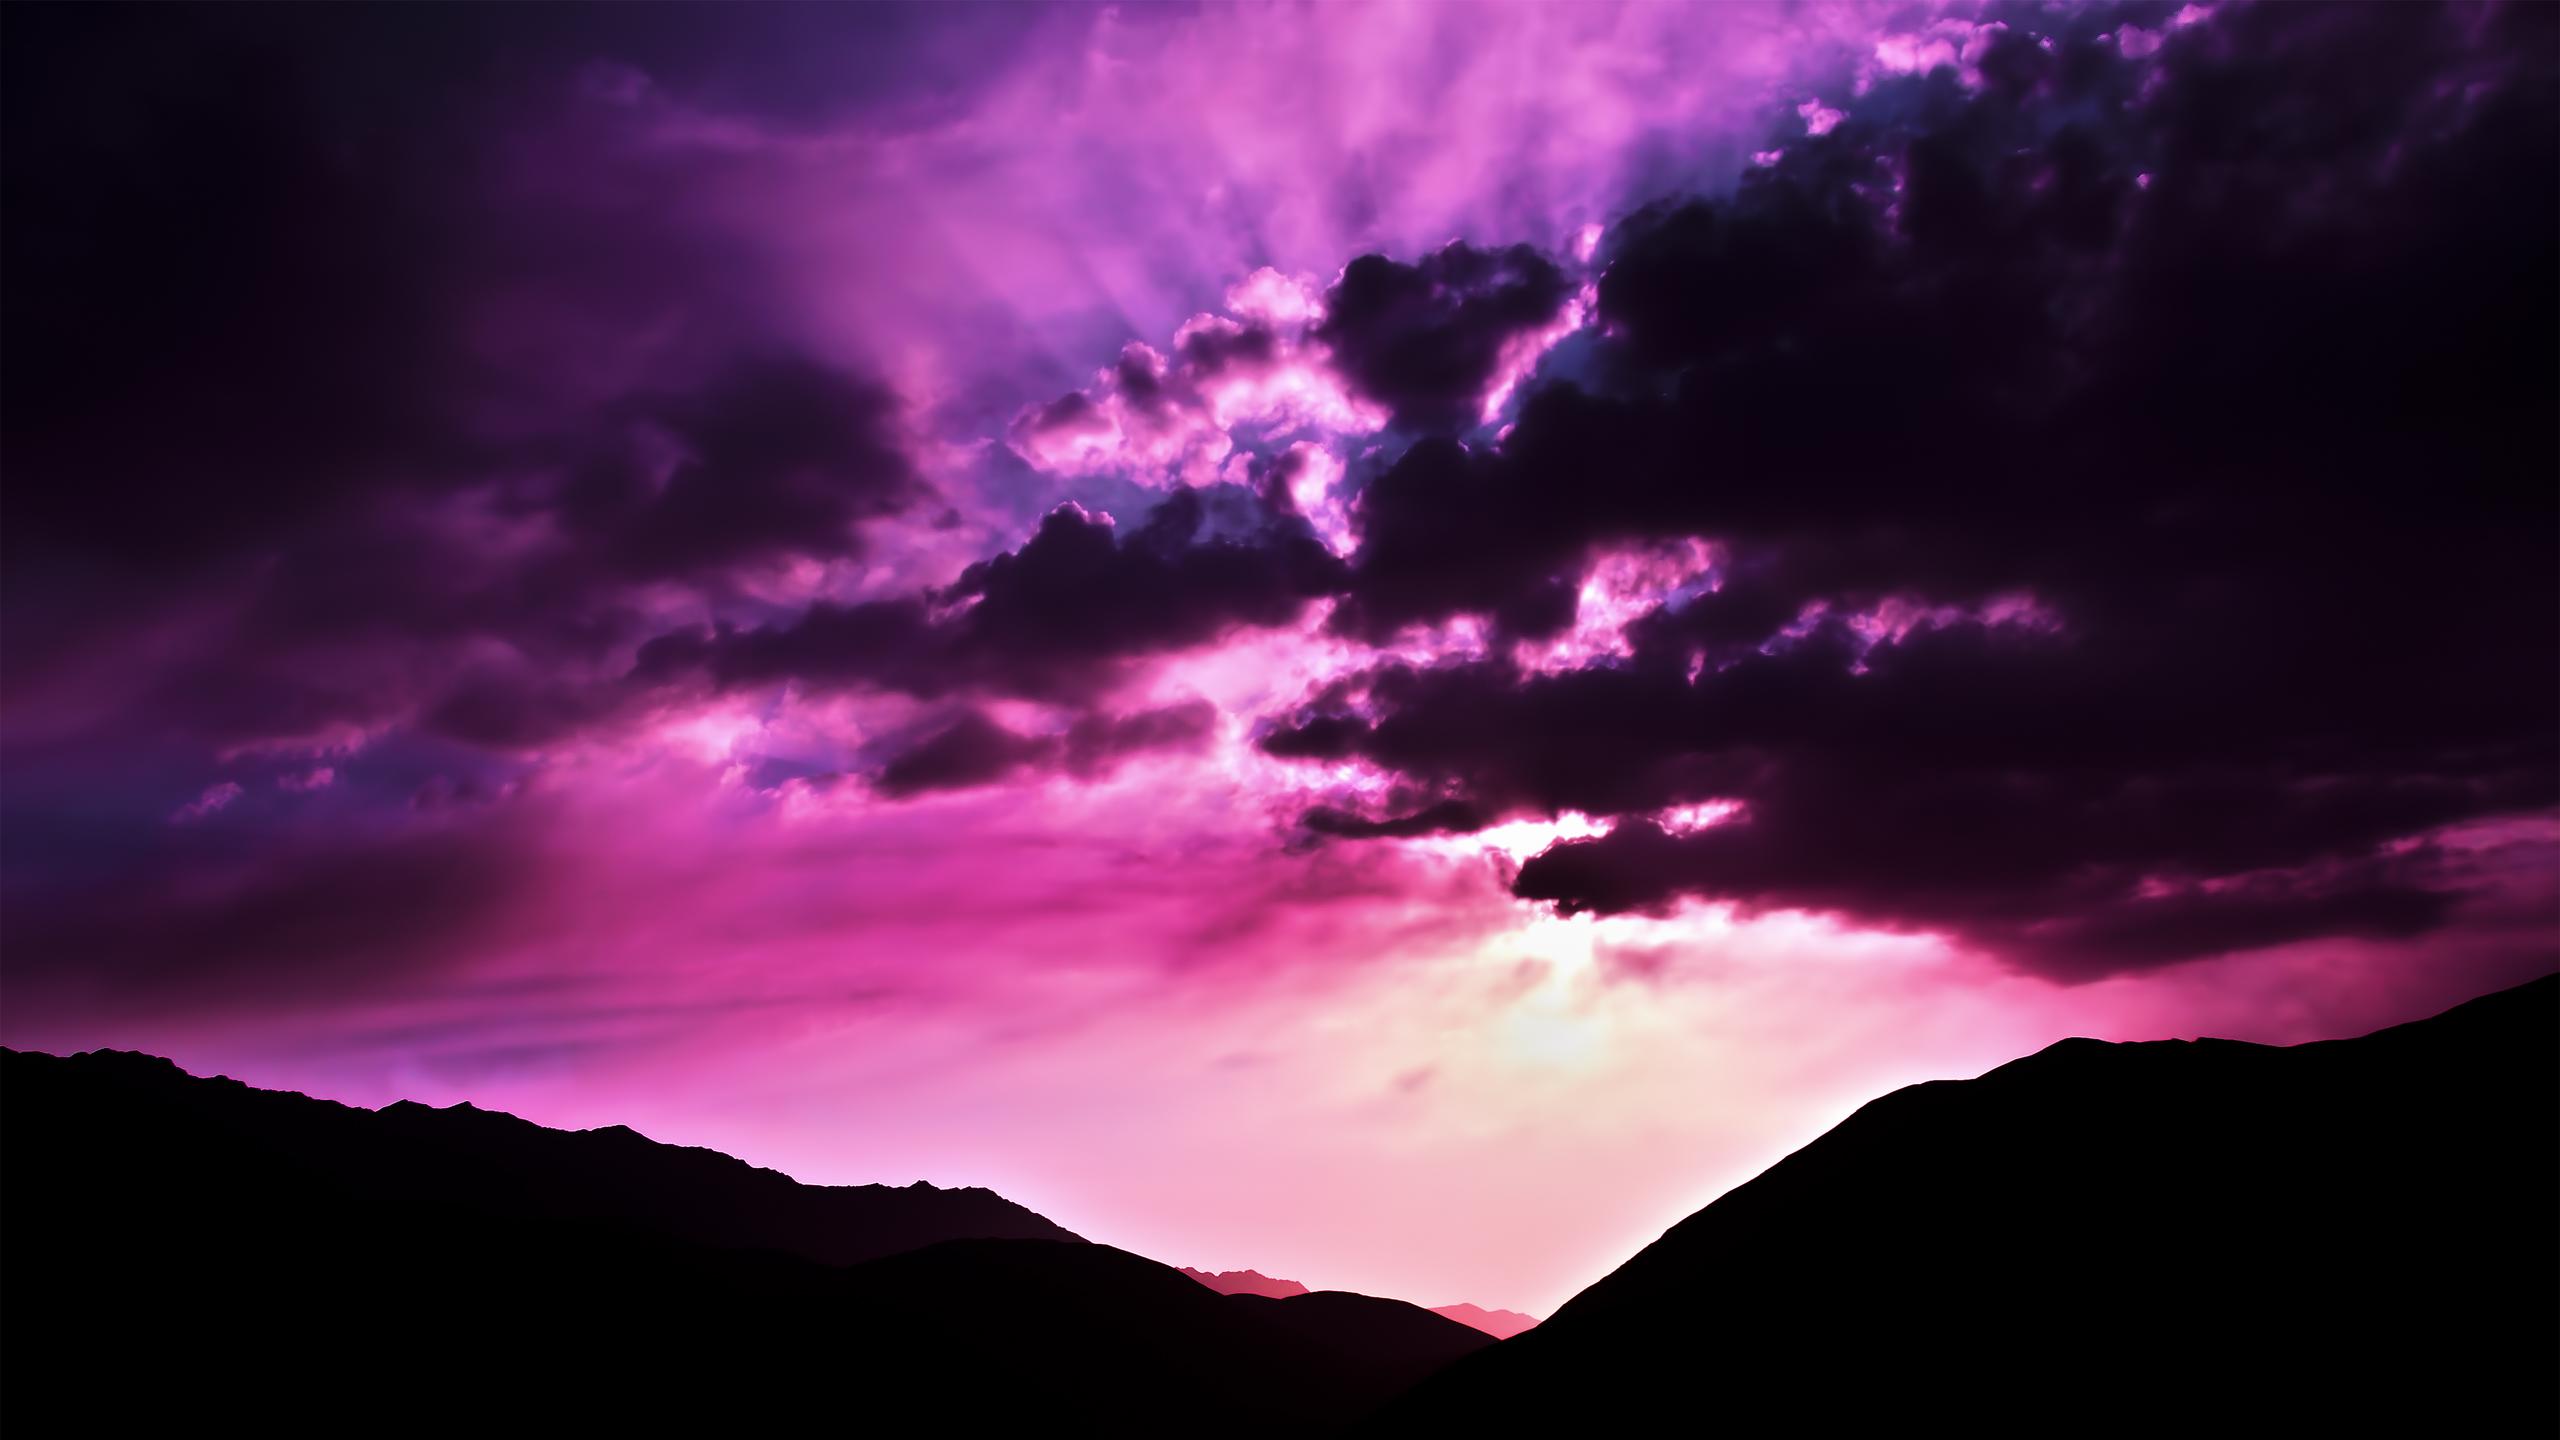 purple_morning_2560x1440